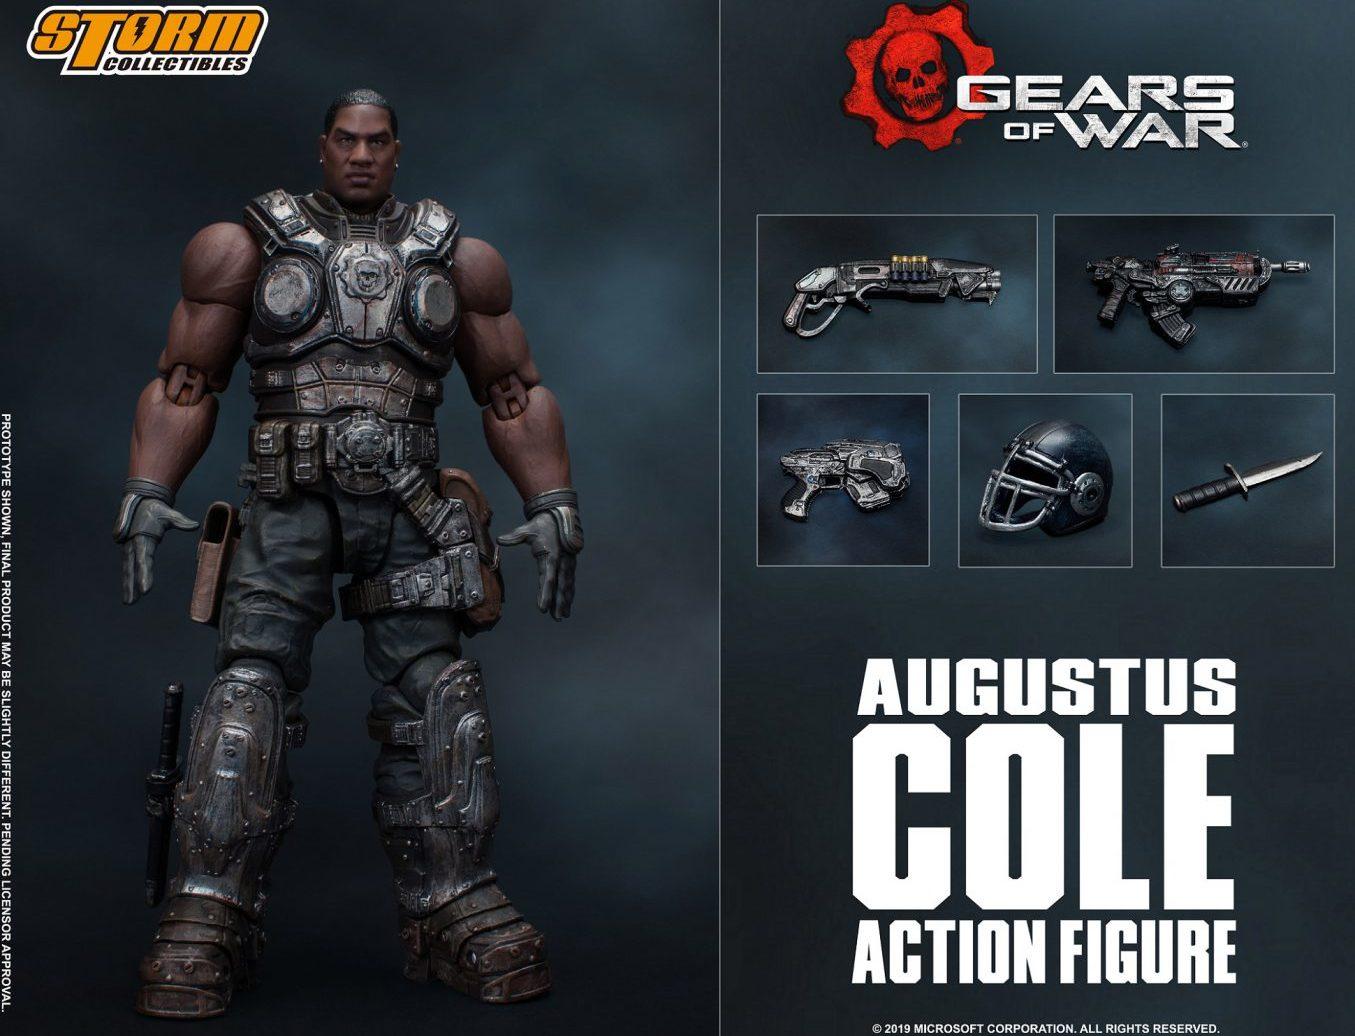 gears of war коллекционная фигурка